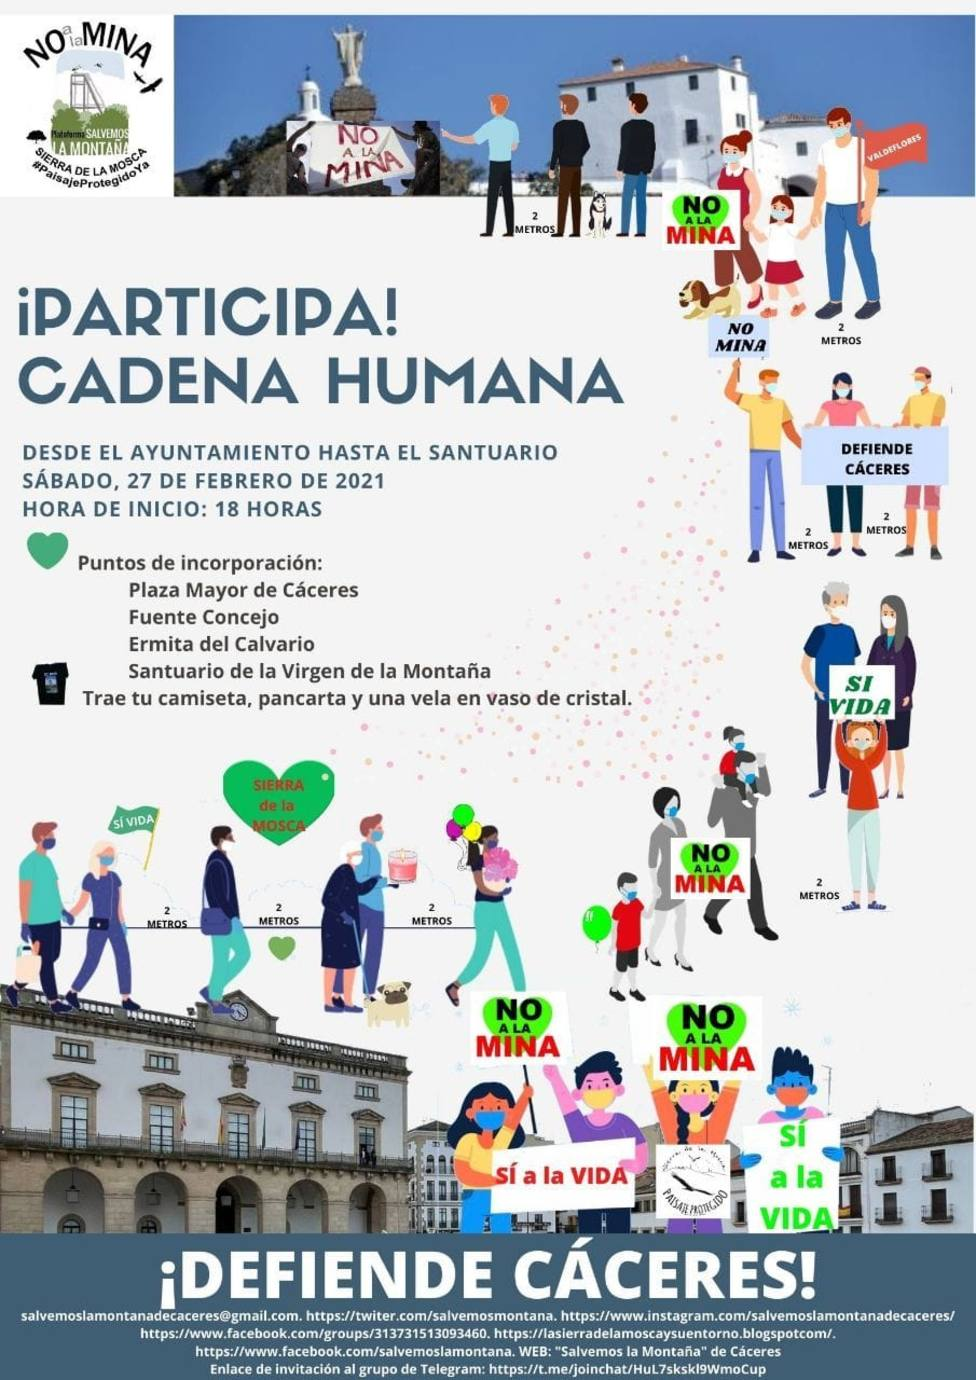 Cadena humana No a la Mina este sábado en Cáceres